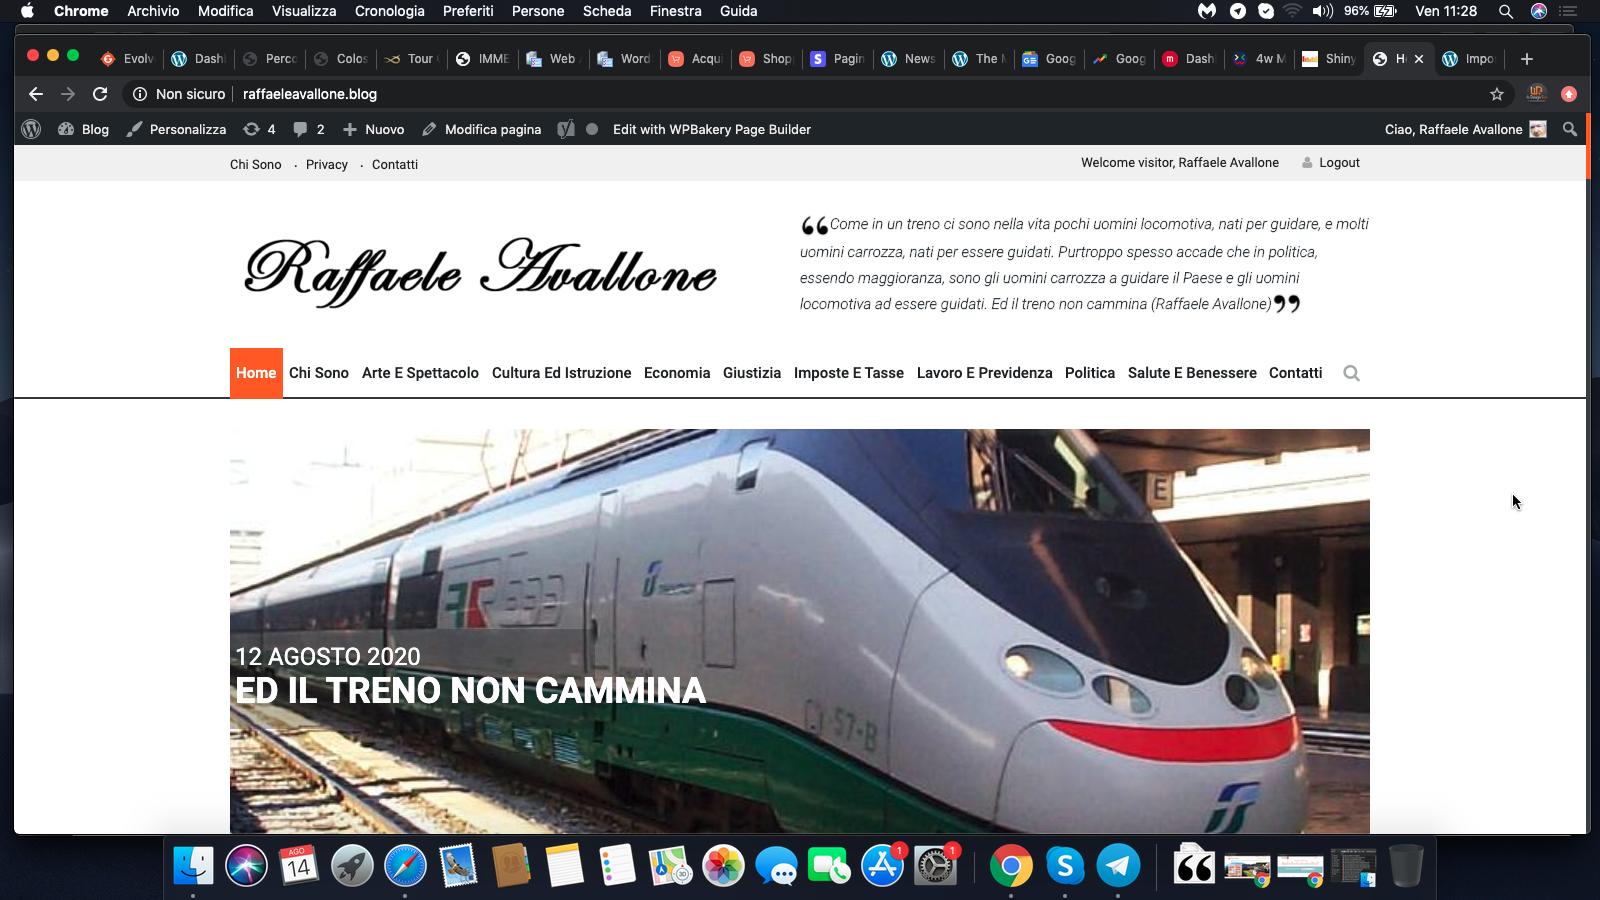 Raffaele Avallone Blog